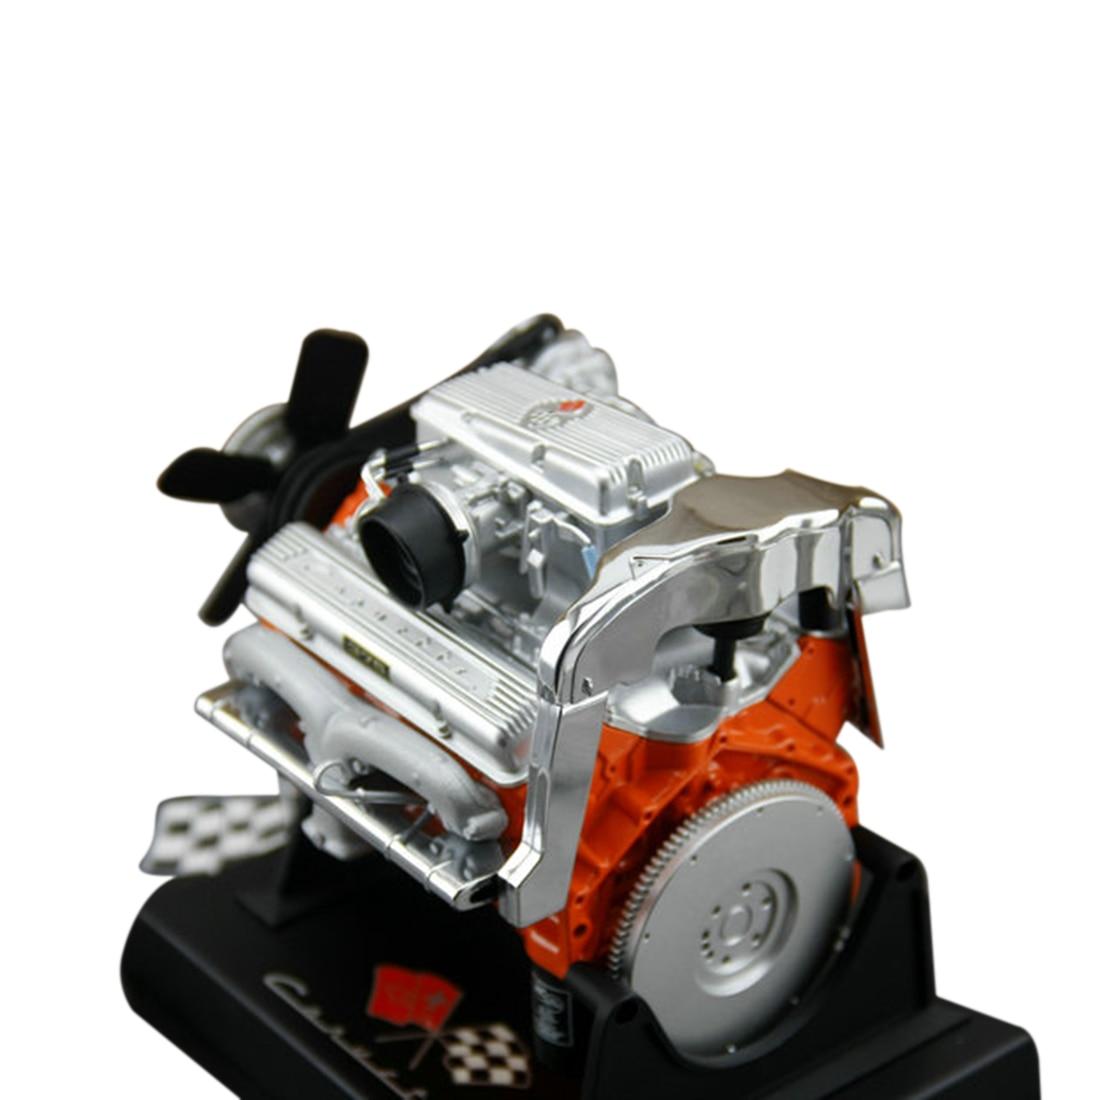 Hot Sale 1:6 Ratio New Out-Of-Print Engine Model For Chevrolet Corvette V8 Sedan Educational Toy Gift For Kids Children Adults